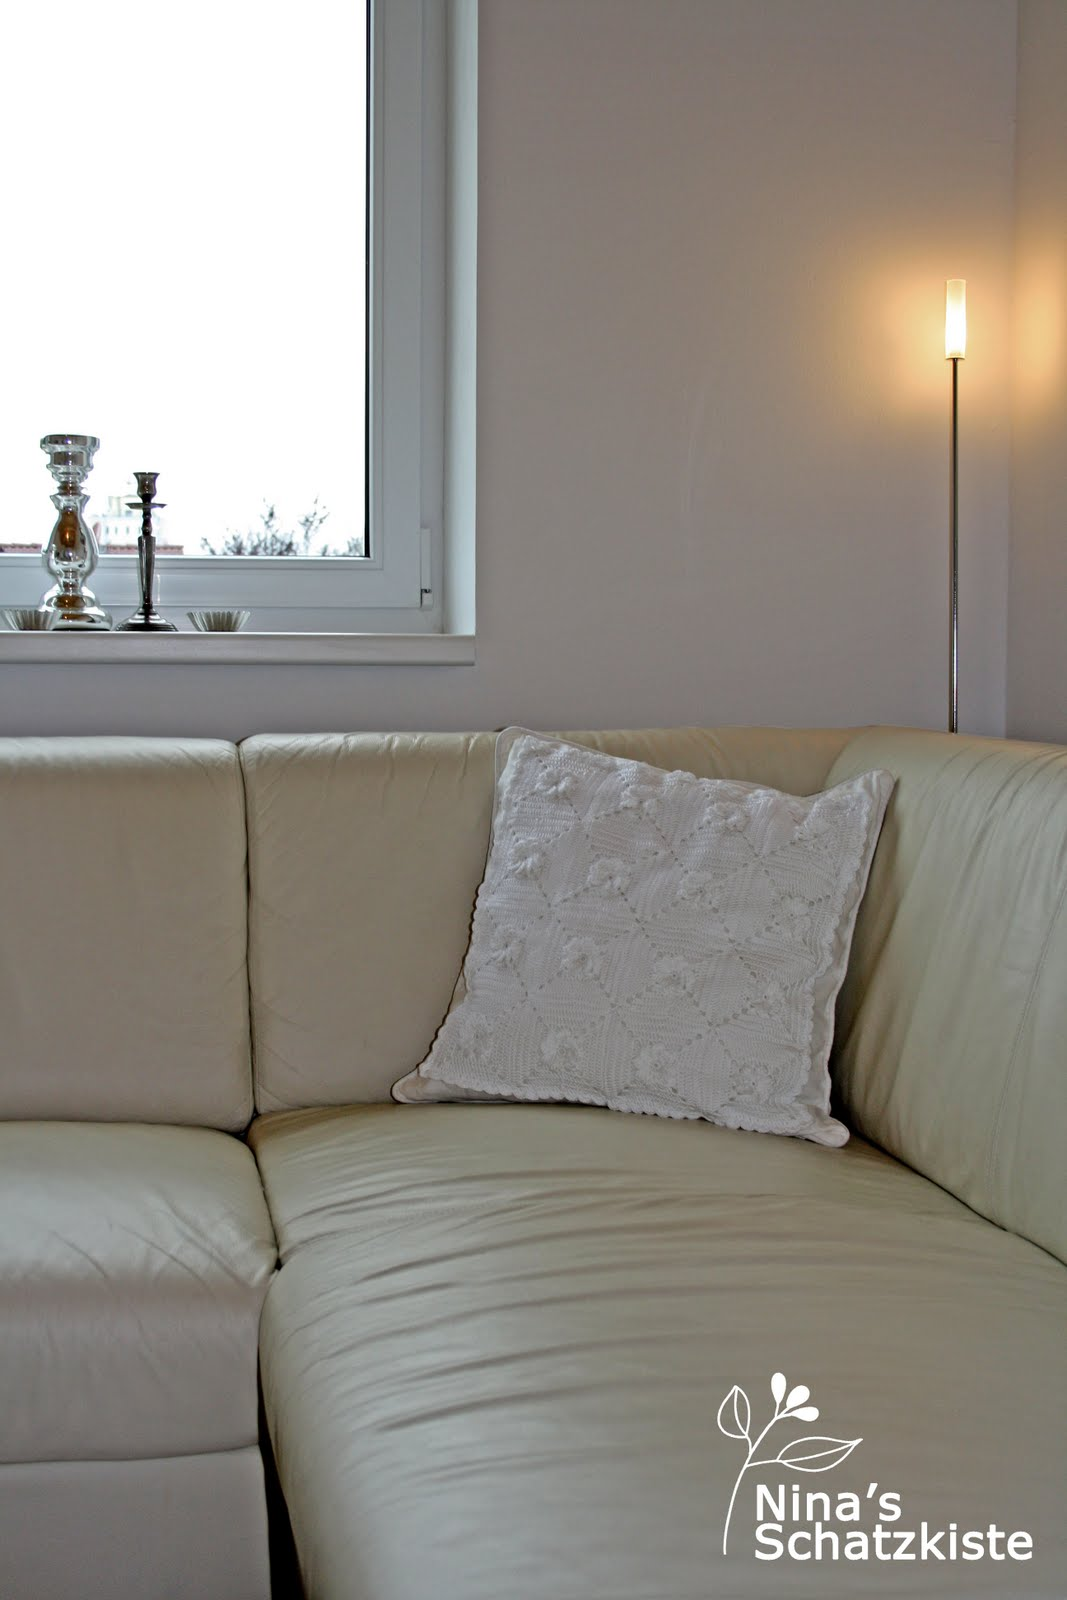 nina 39 s schatzkiste h kelpolster finale. Black Bedroom Furniture Sets. Home Design Ideas